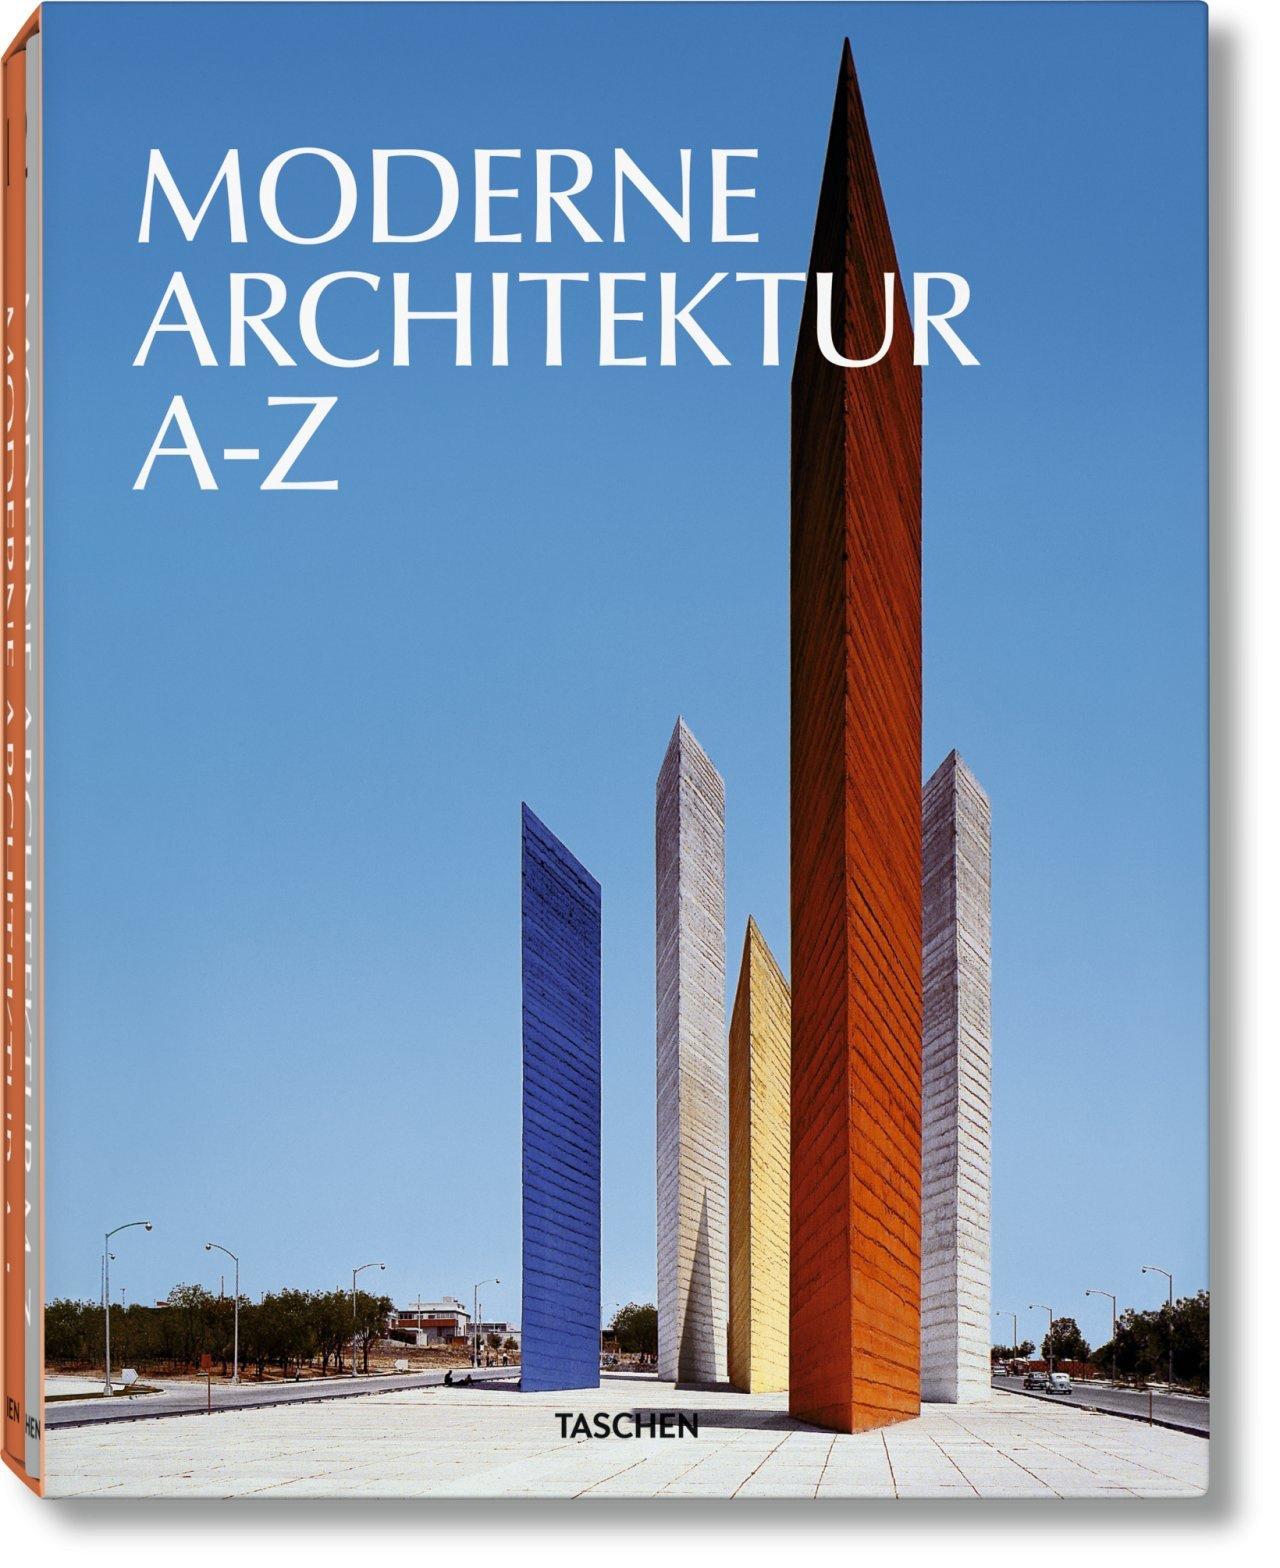 Moderne Architektur A-Z | XL Ausgabe